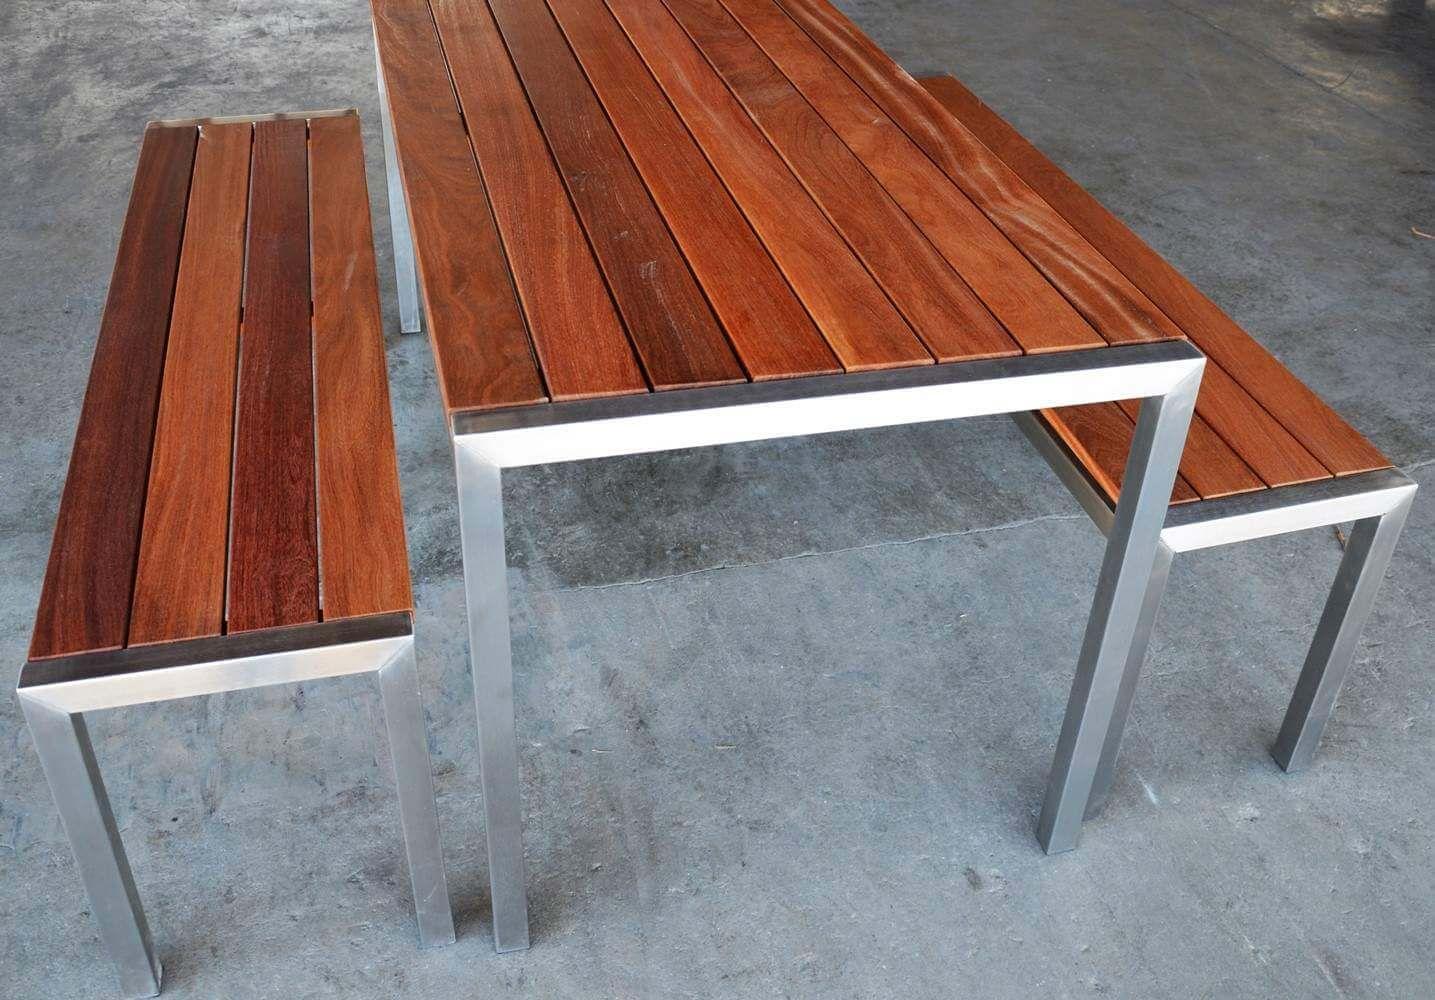 Gartenmobel Aus Tropenholz Von Betterwood Fsc 100 Industriedesign Mobel Gartengarnitur Holz Gartenmobel